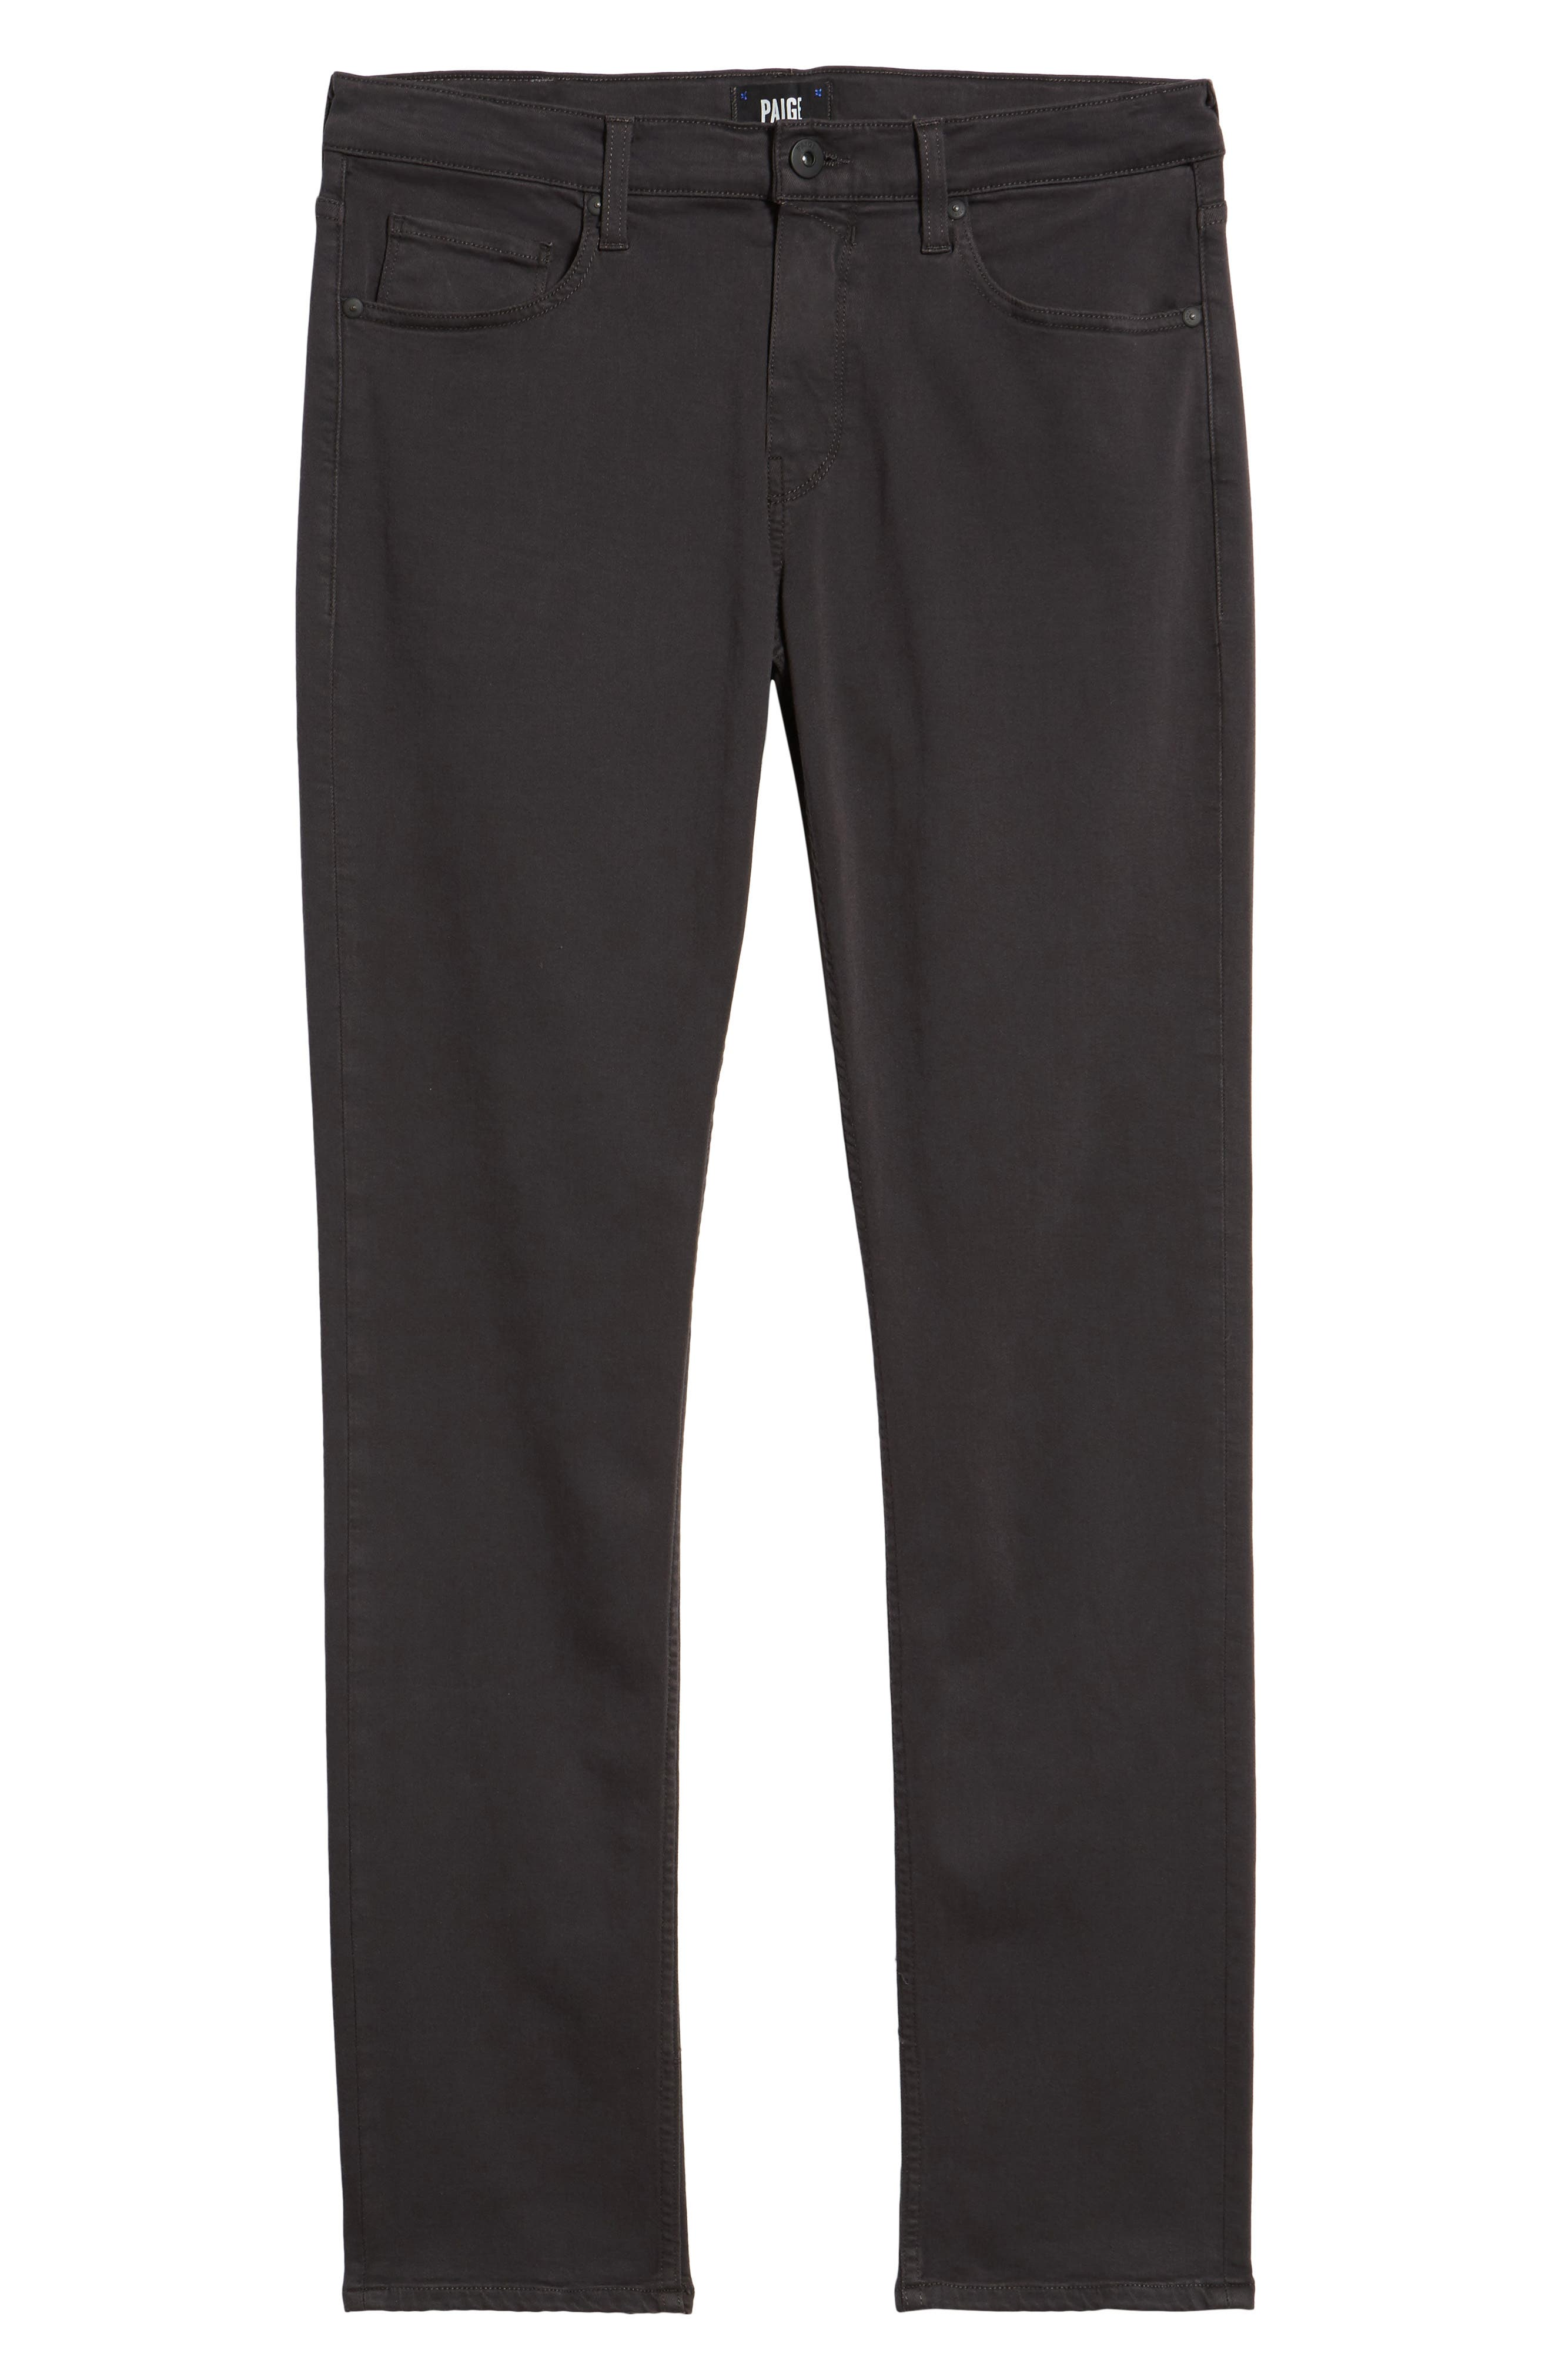 Transcend - Lennox Slim Fit Jeans,                             Alternate thumbnail 6, color,                             021